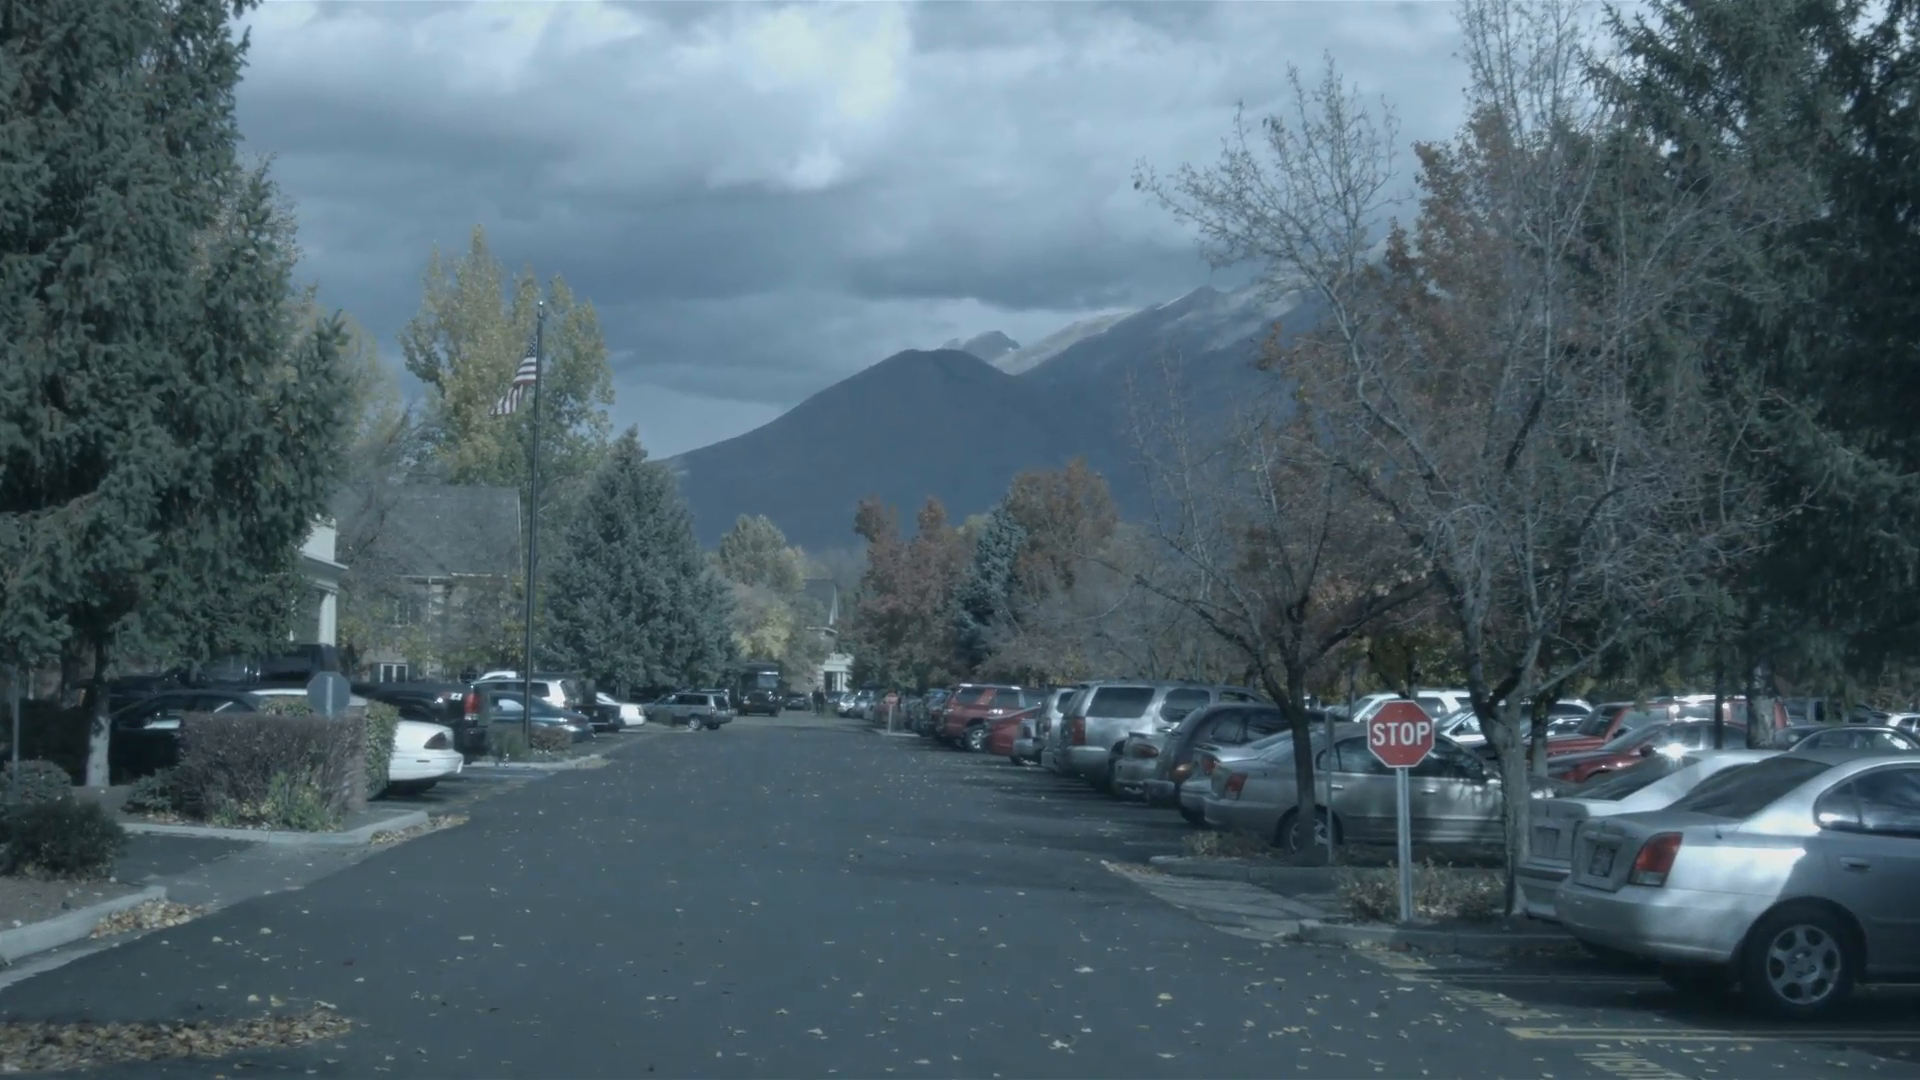 Business road parking lot cars autumn storm POV HD 001 Stock Video Footage  - VideoBlocks - Parking Lot PNG HD